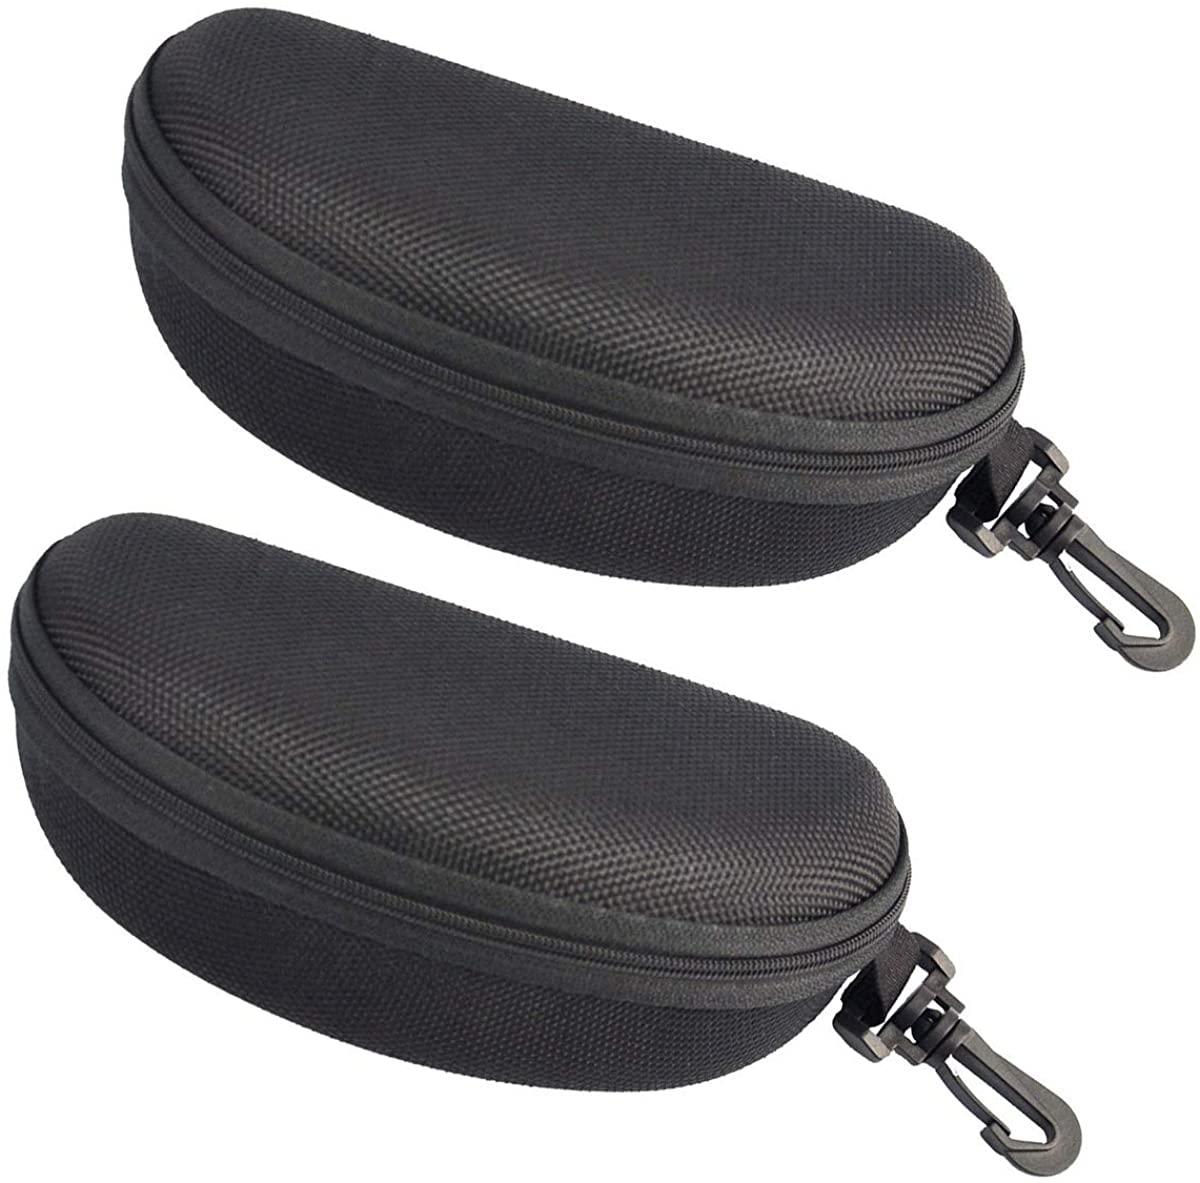 ATTEEN 2Pcs Zipper Sunglasses Case Hard Shell Eyeglasses Case with Carabiner Hook